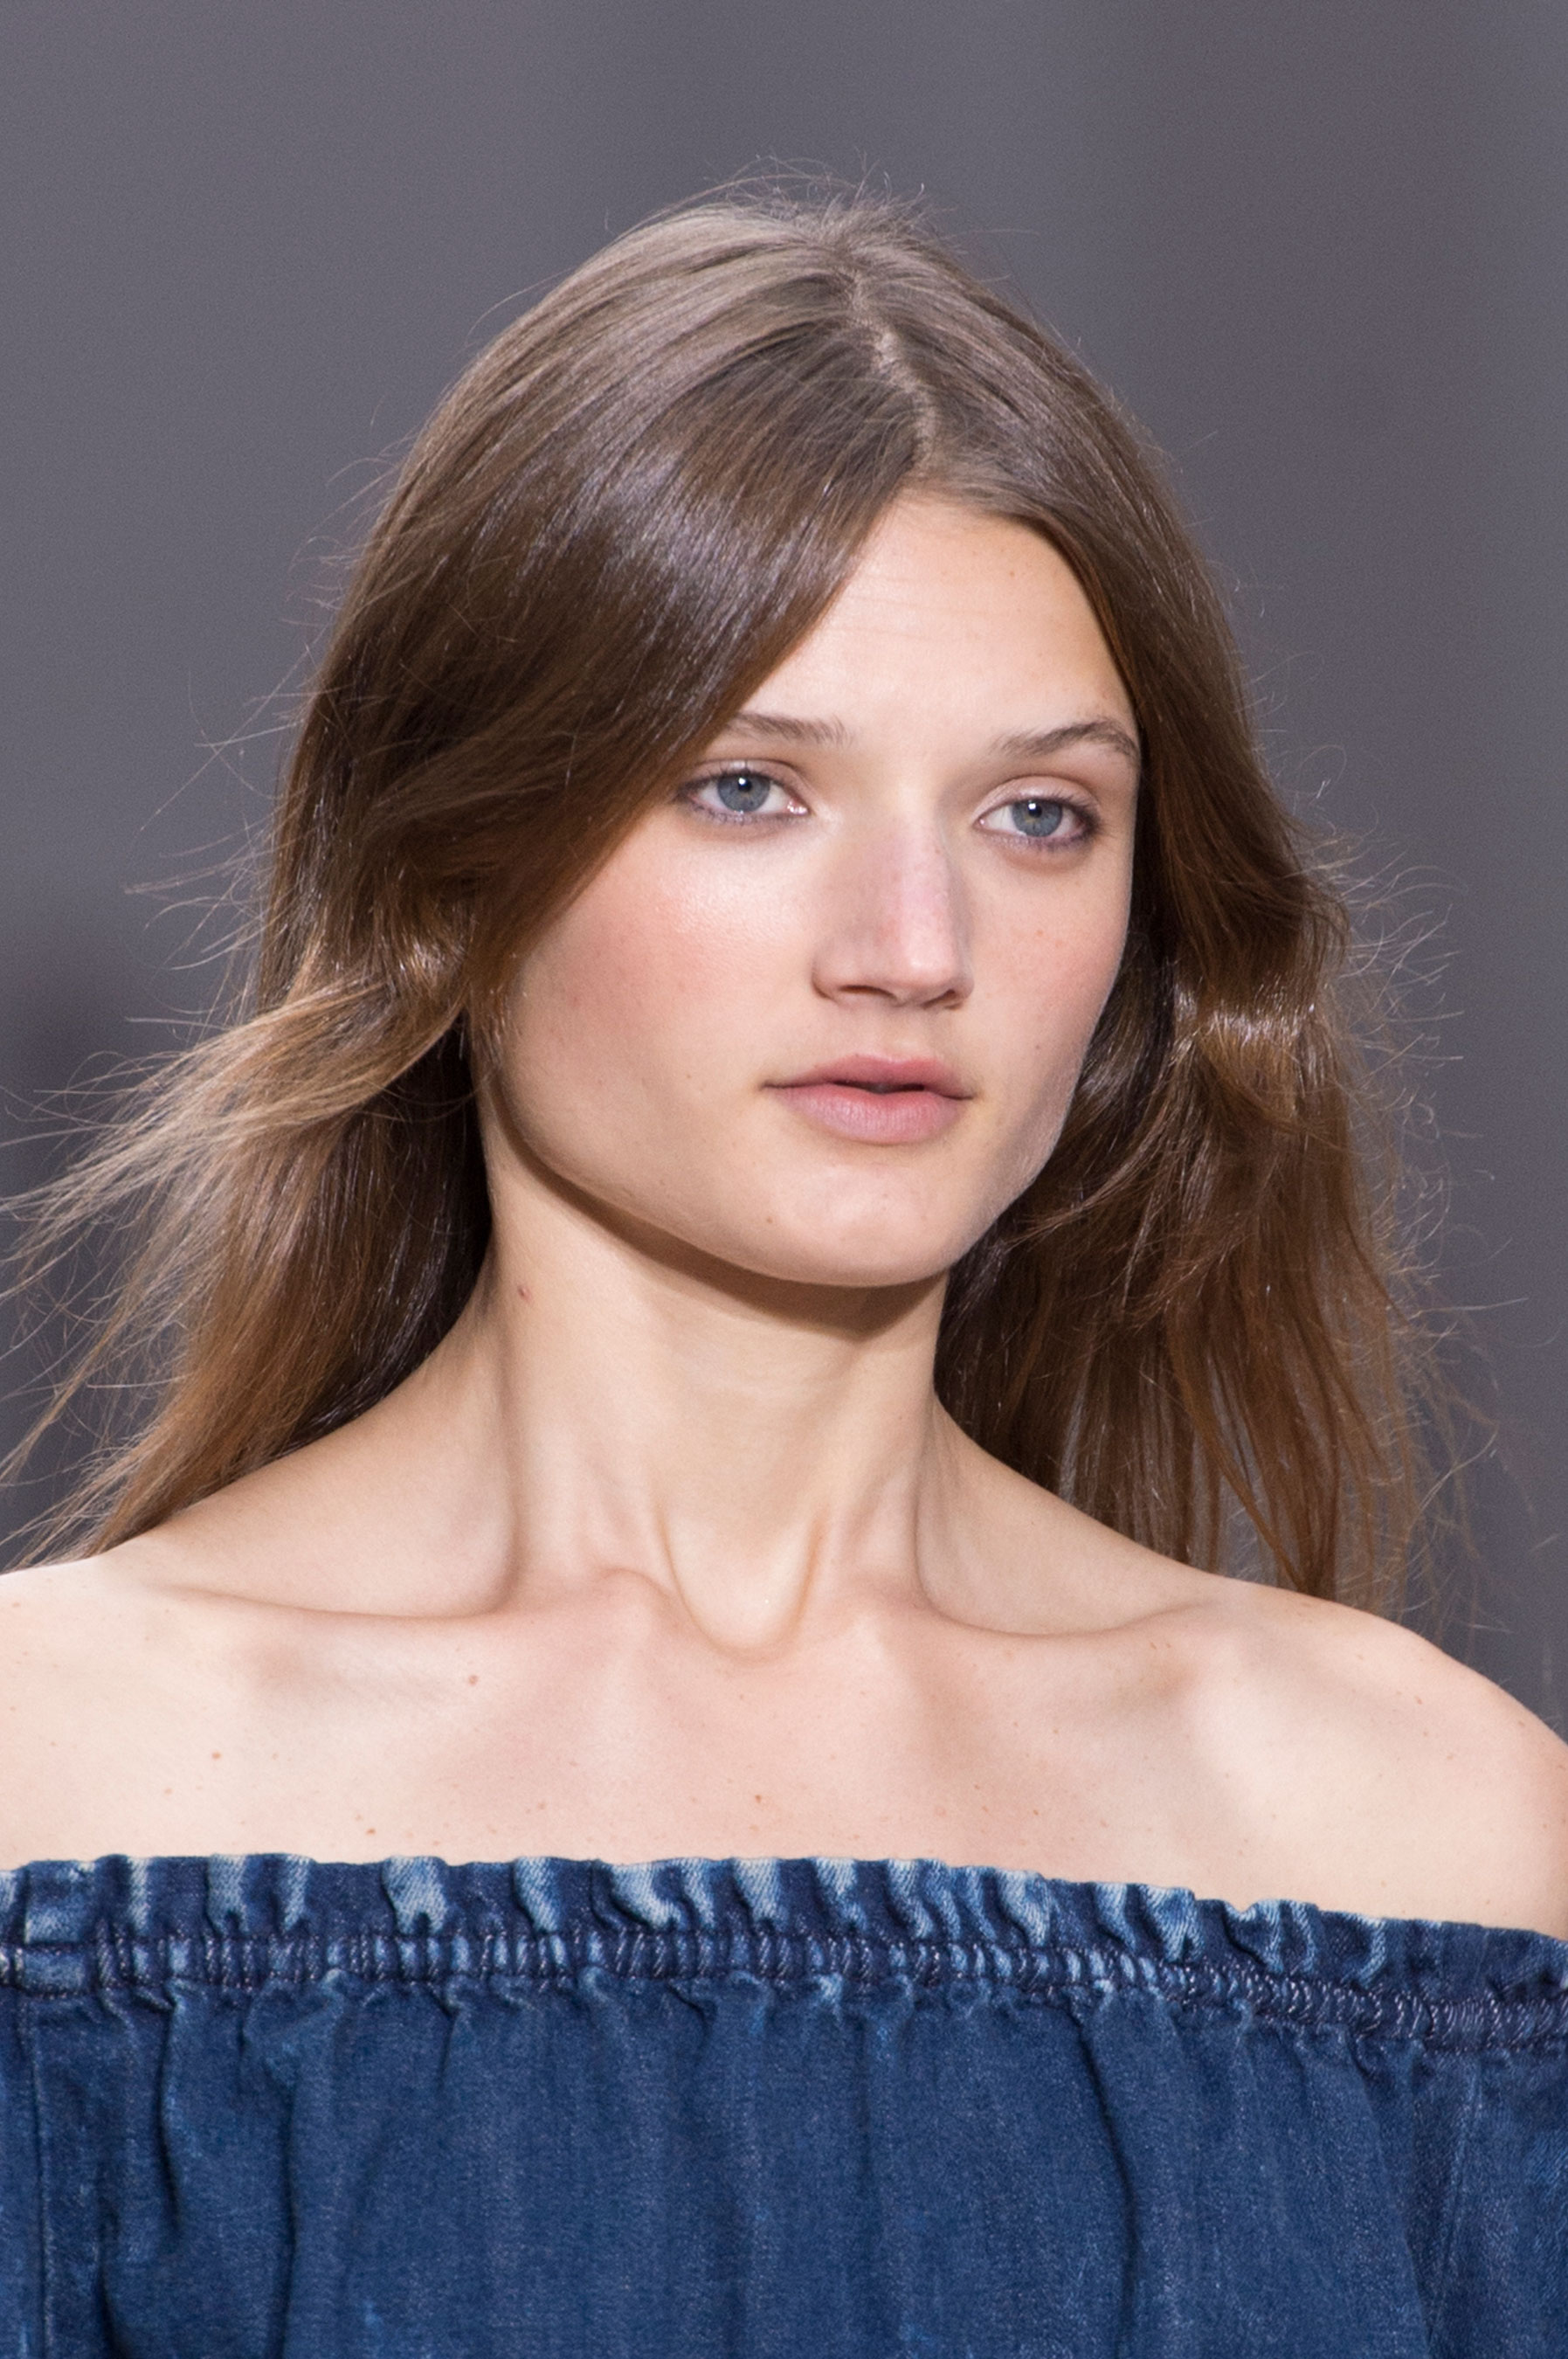 Chloe-spring-2016-runway-beauty-fashion-show-the-impression-14